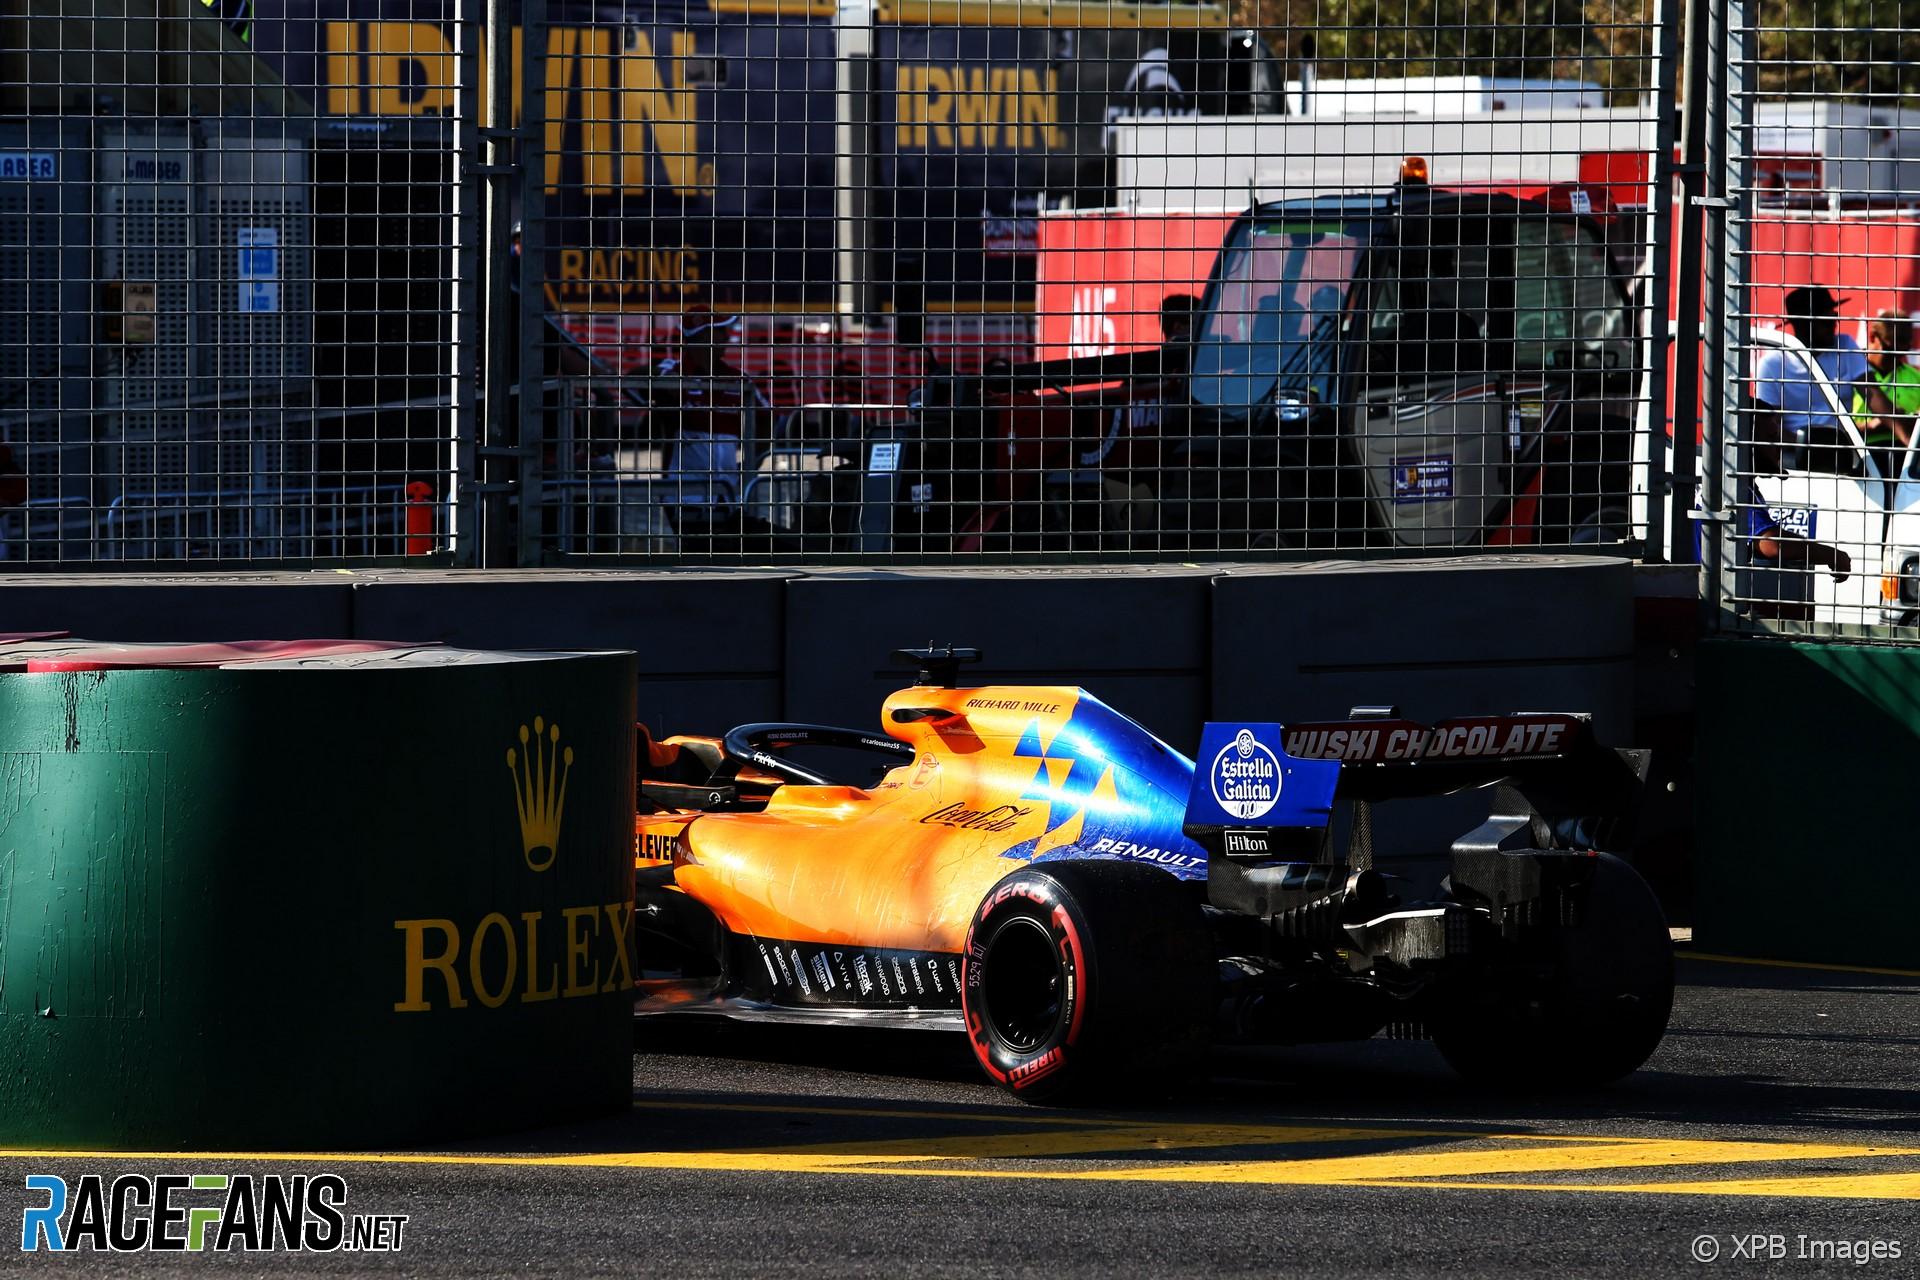 Renault F1 team introduce new MGU-K to improve reliability